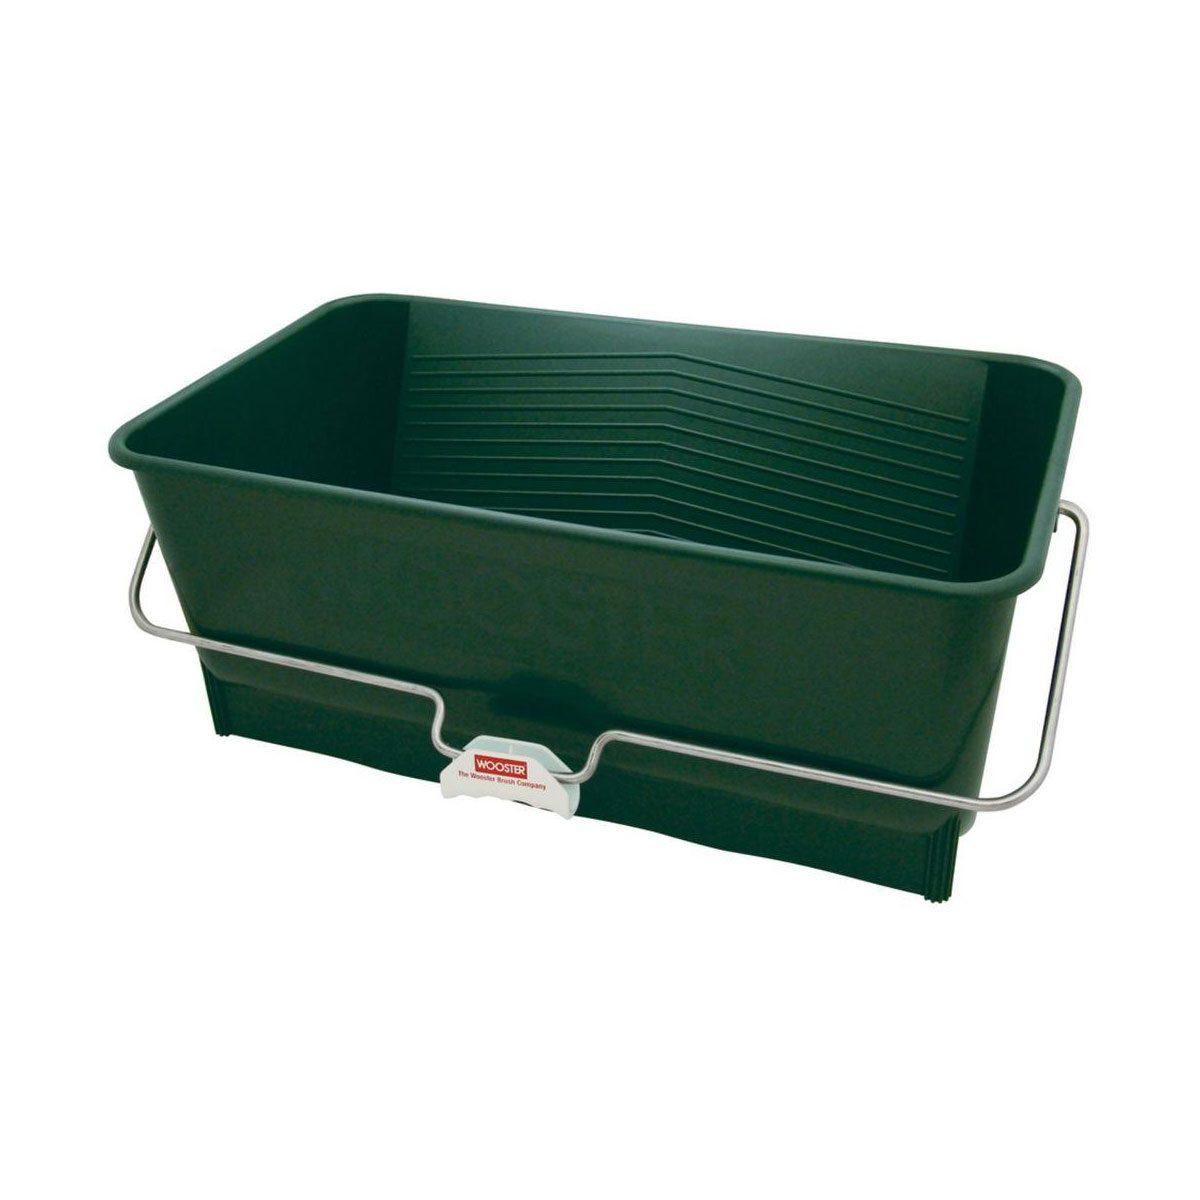 Paint Bucket Green Wooster Paint Buckets 0086140000 64 1000